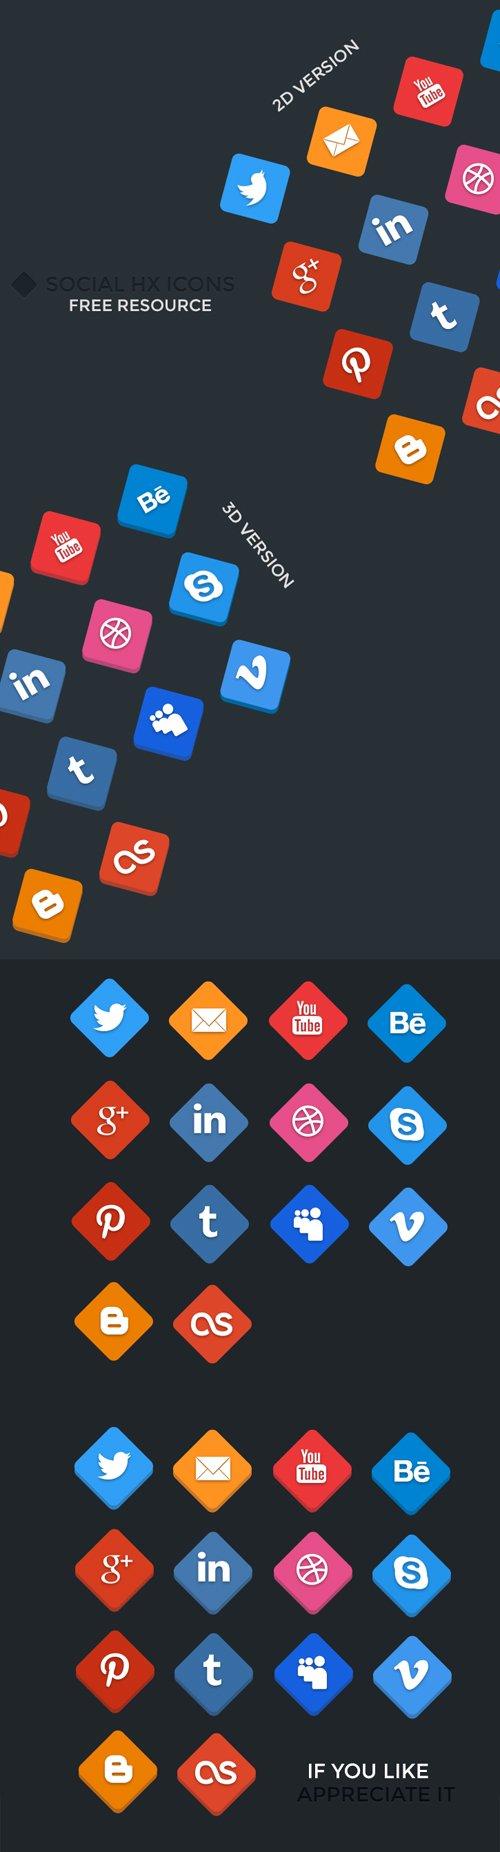 Social HX Icons - 2D/3D 设计素材下载